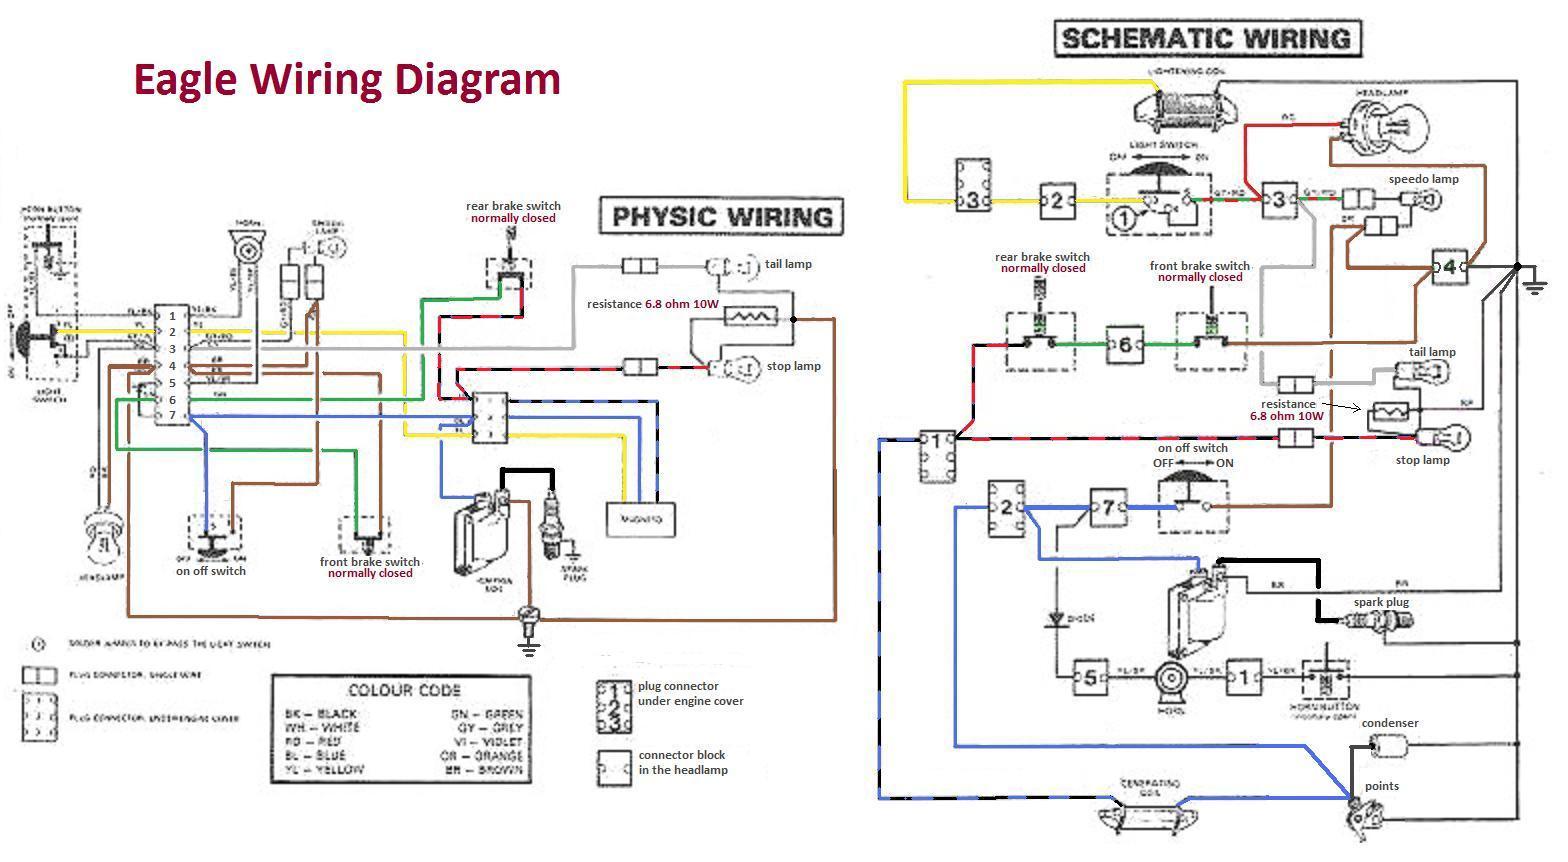 Eagle Wiring Diagram1 1995 yamaha blaster parts diagram